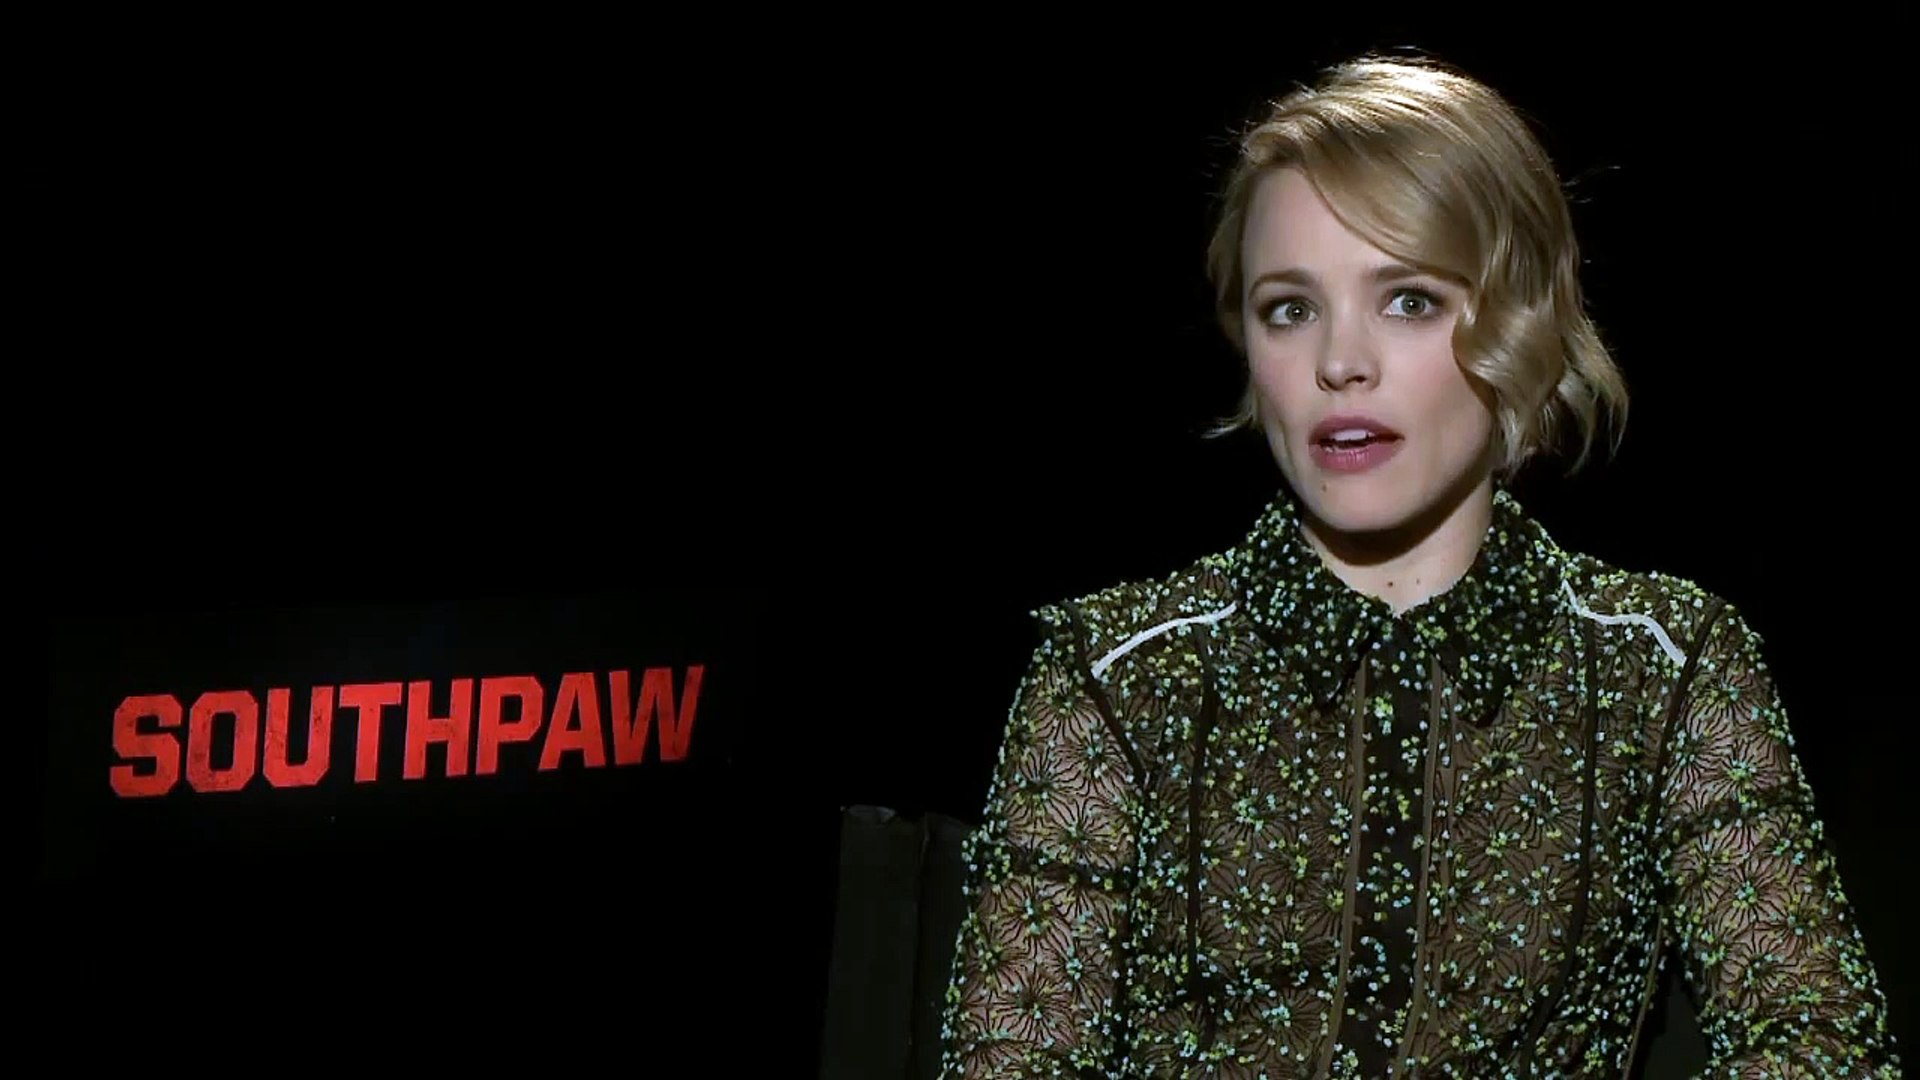 Southpaw Cast Interviews